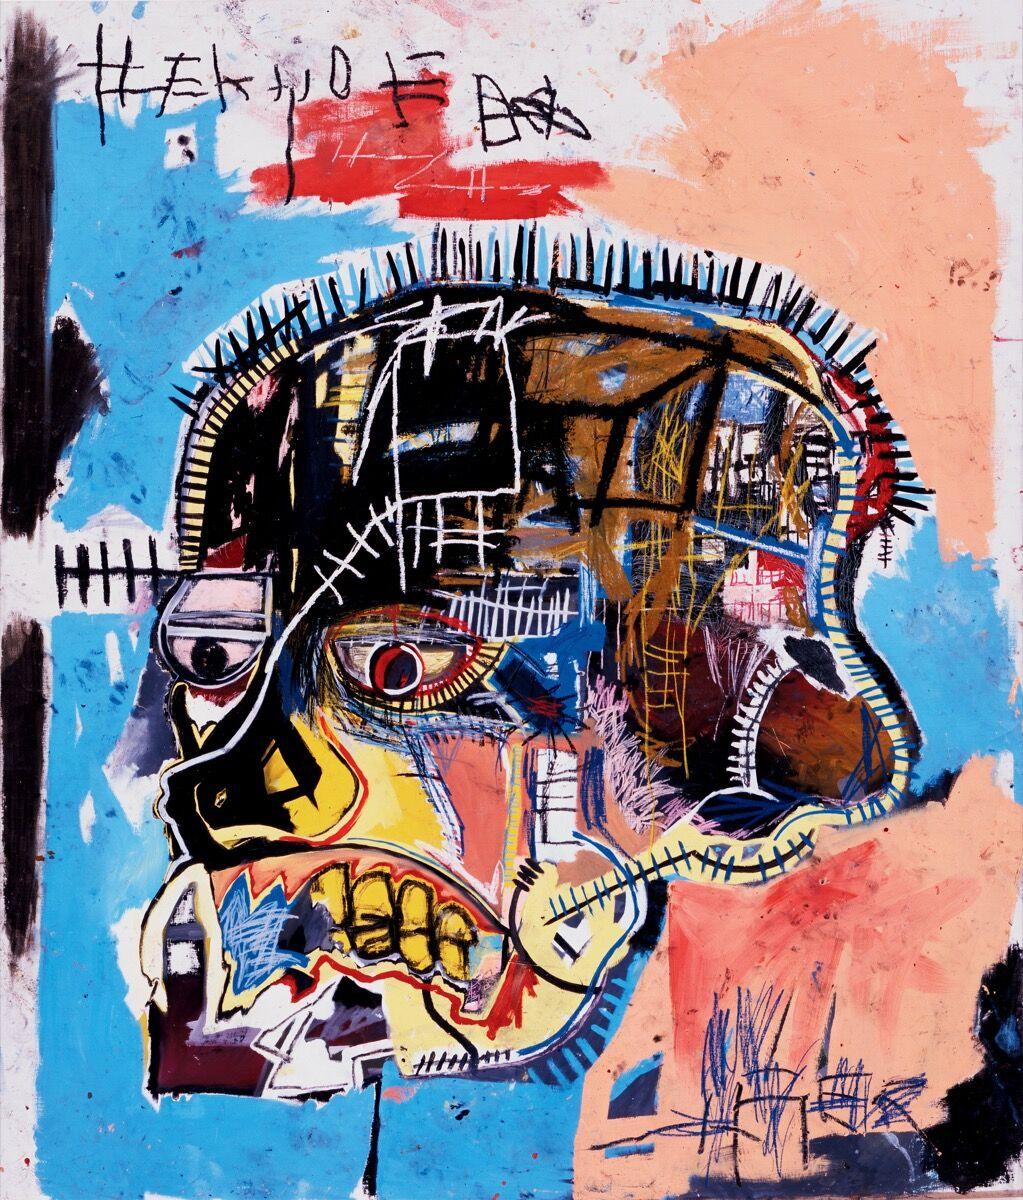 Jean-Michel Basquiat,  Untitled,  1981. © Estate of Jean-Michel Basquiat. Licensed by Artestar, New York. Photo © Douglas M. Parker Studio, Los Angeles.